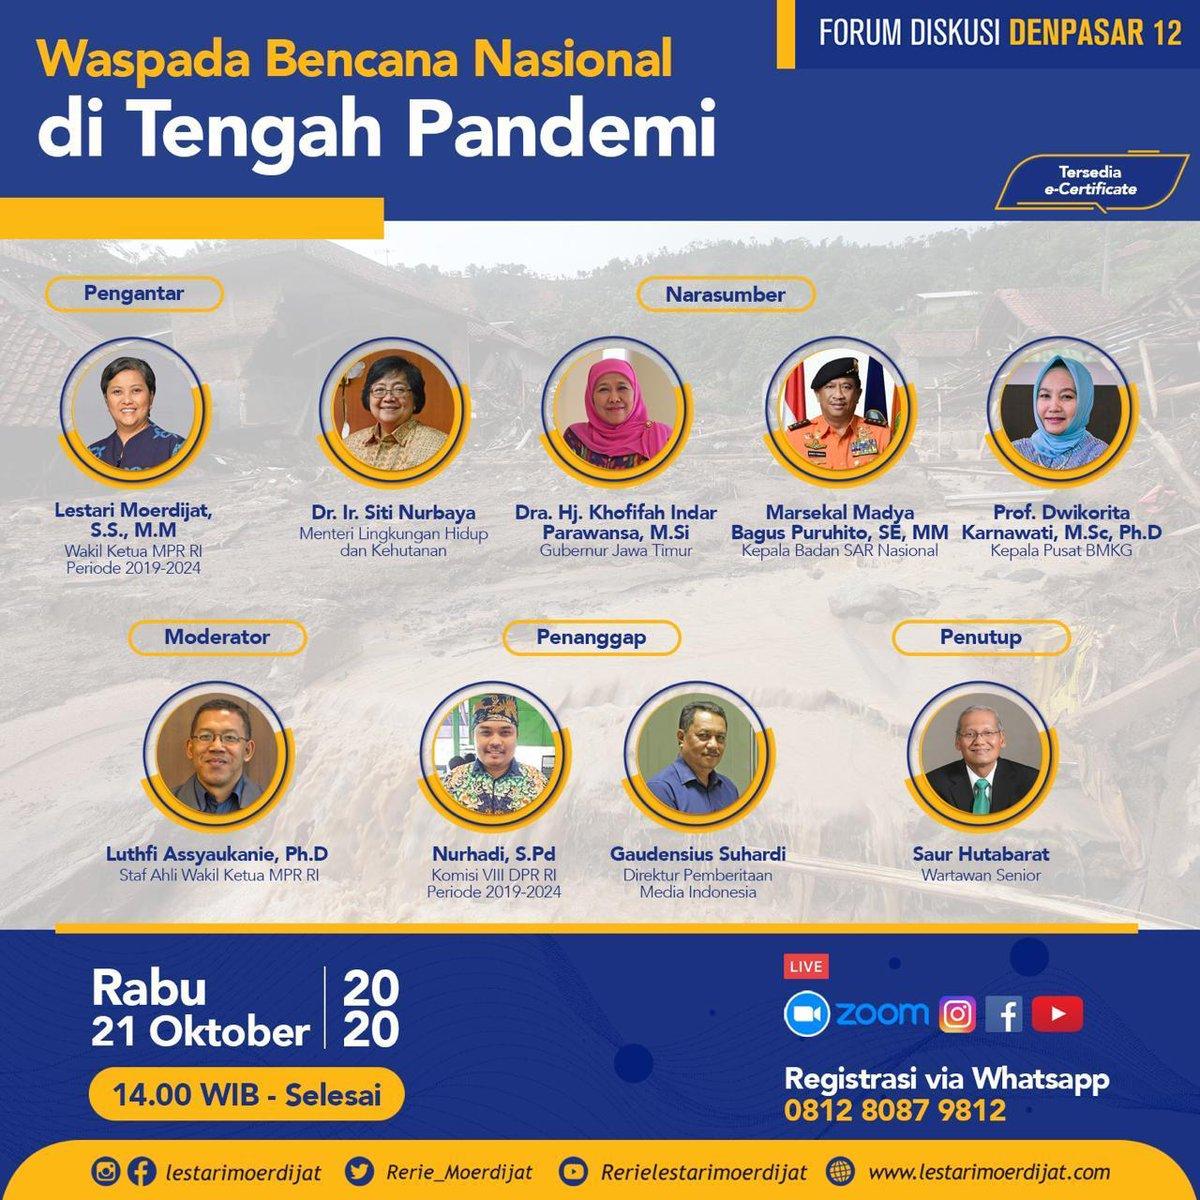 Forum Diskusi Denpasar 12 memasuki Edisi XXX. Tema yang akan dibahas kali ini adalah Waspada Bencana Nasional di Tengah Pandemi. Sambil mengoptimalkan segala upaya mengendalikan penyebaran wabah, kita waspadai bencana lain. #KabarAnggota  #FilantropiIndonesia https://t.co/fMAlfjgYjO